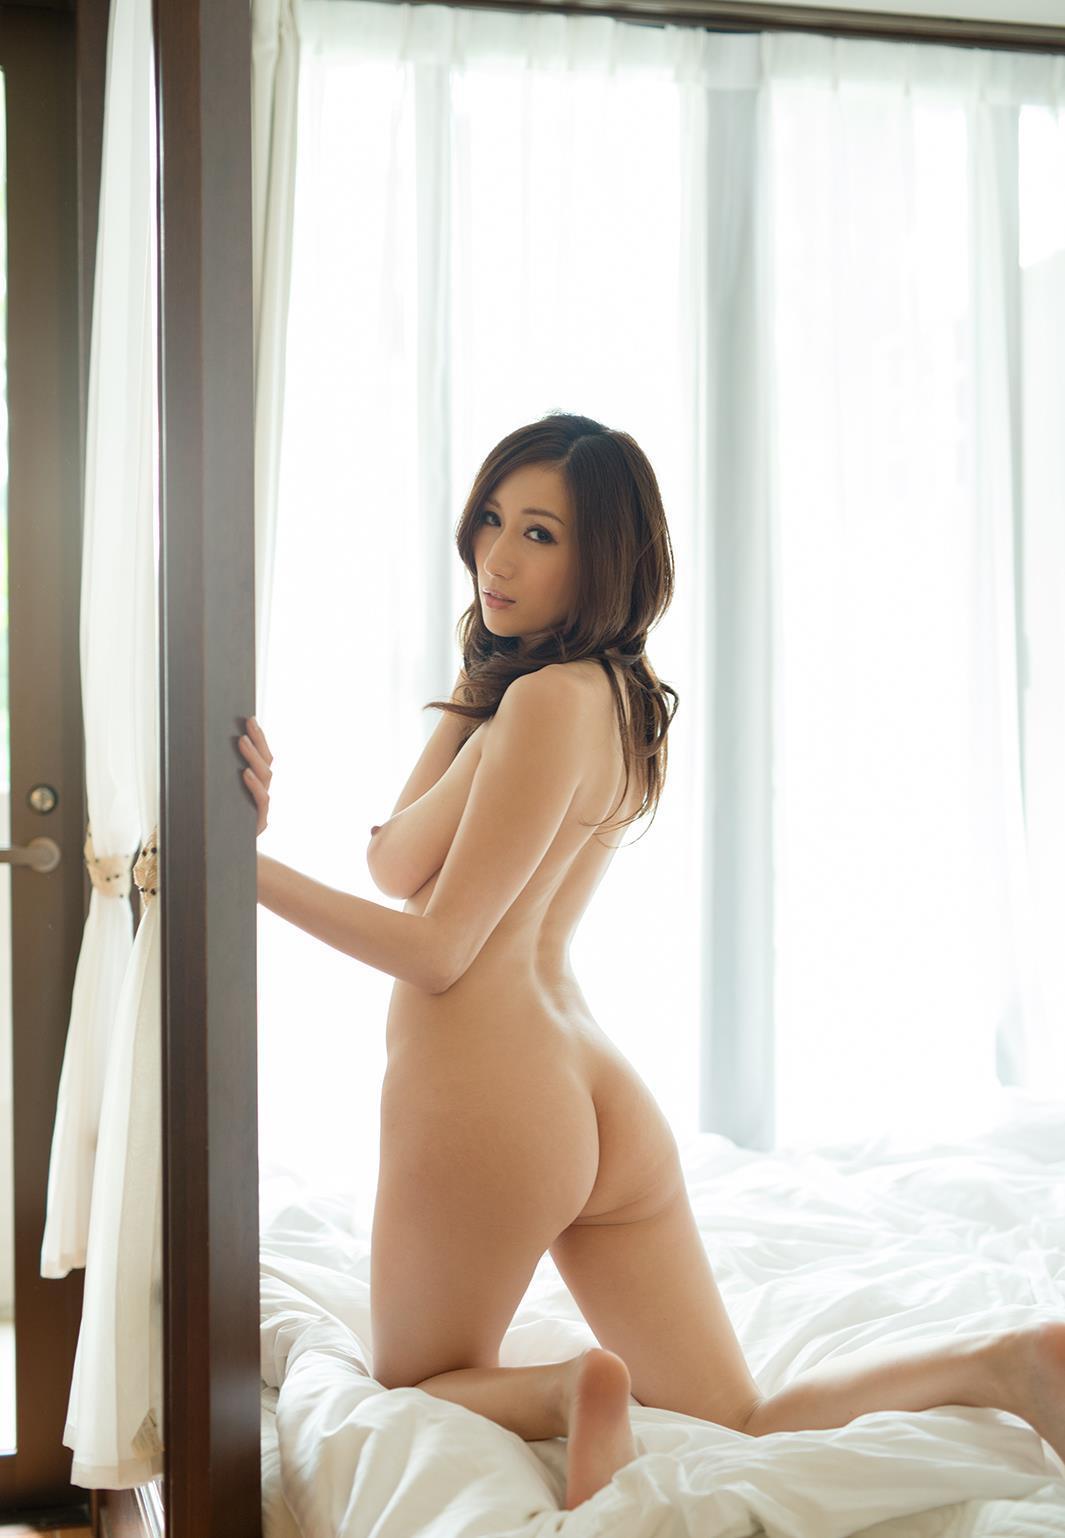 AV女優・JULIA(ジュリア) ヌード画像 22